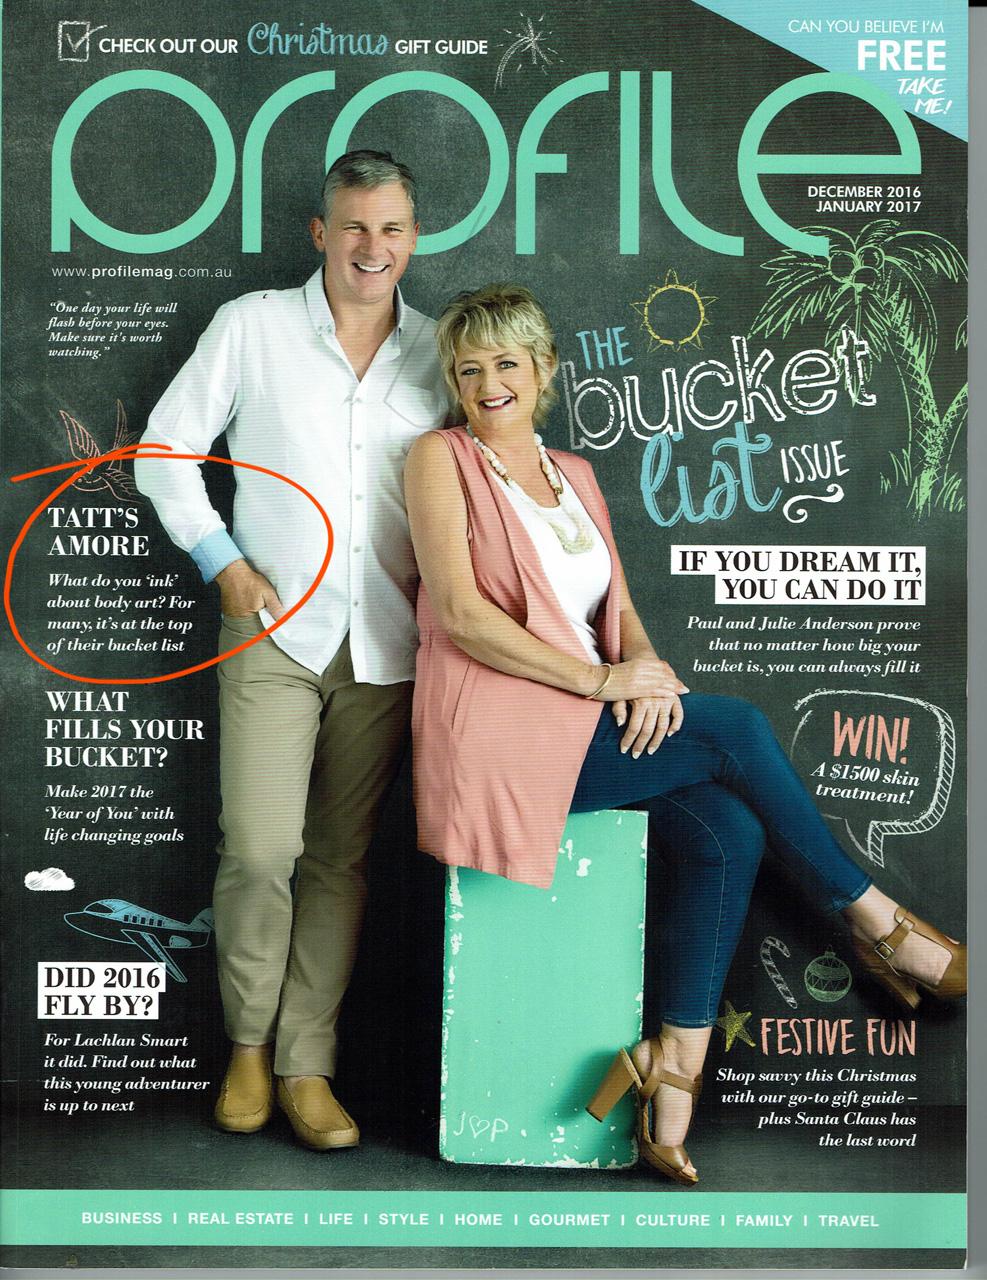 BigFish tattoo in the bucket list edition of Prifile Magazine.